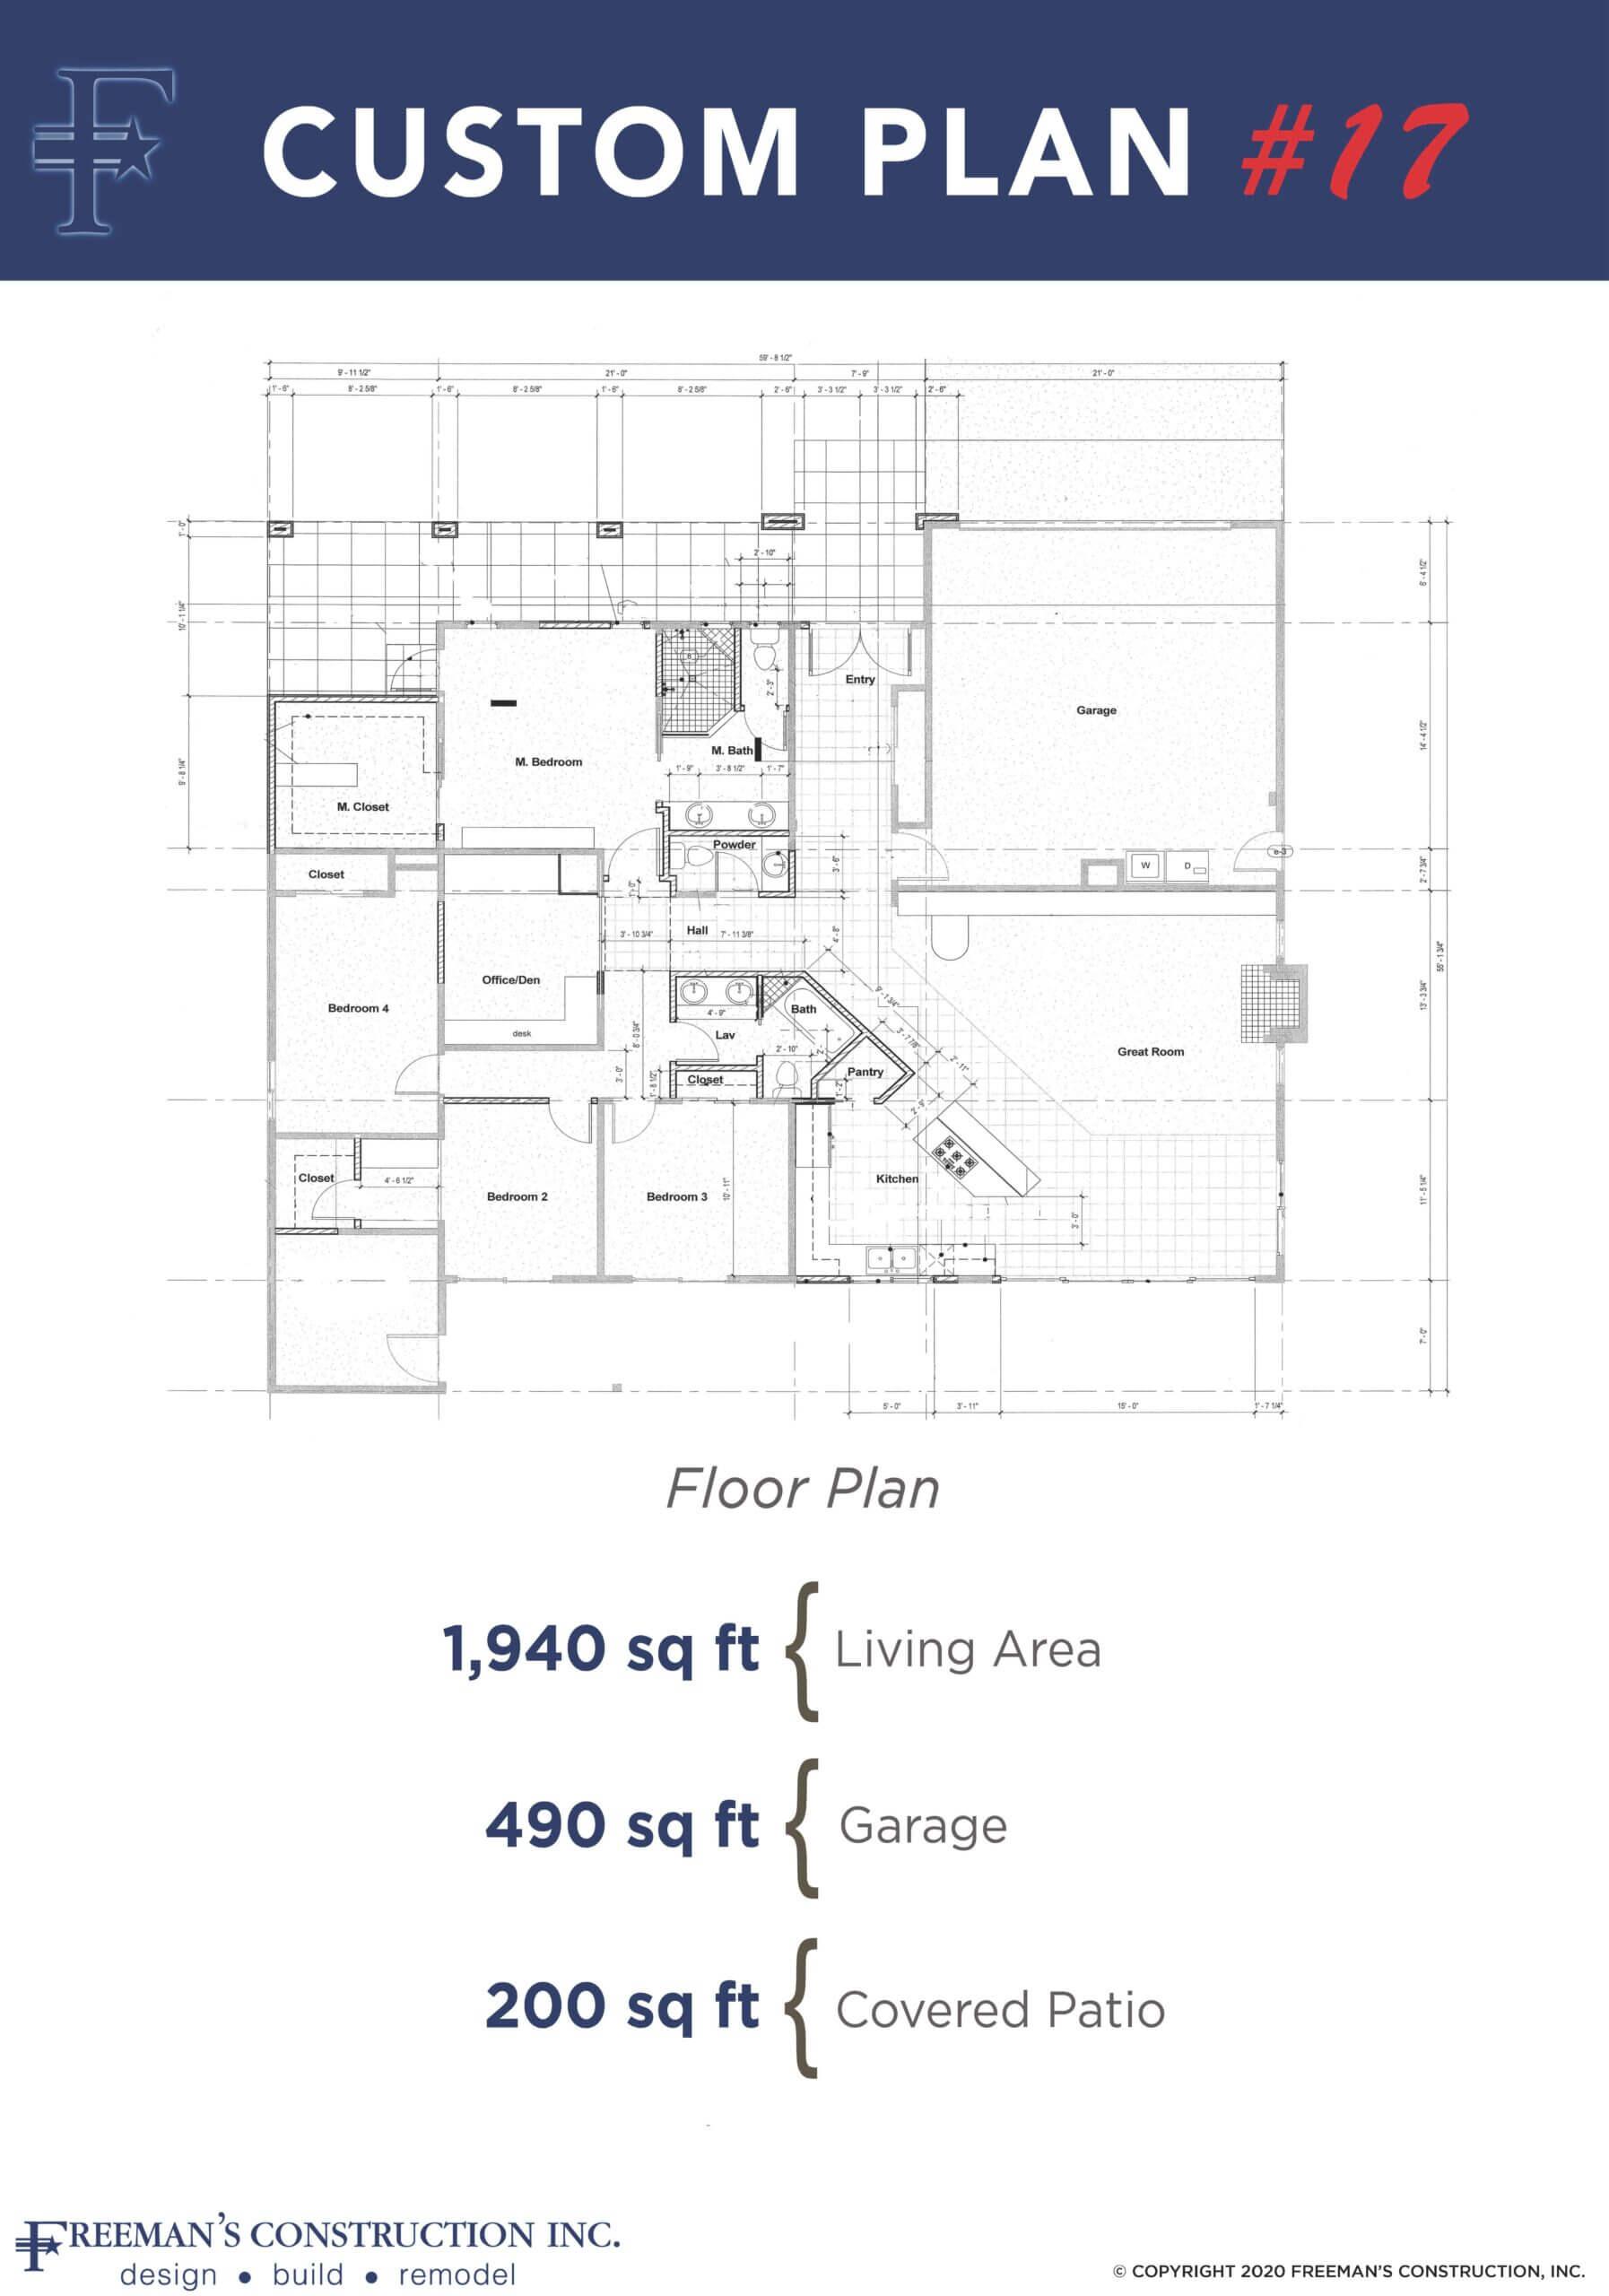 custom-home-floor-plan-17-in-san-diego-county-ca-by-freemans-construction-inc